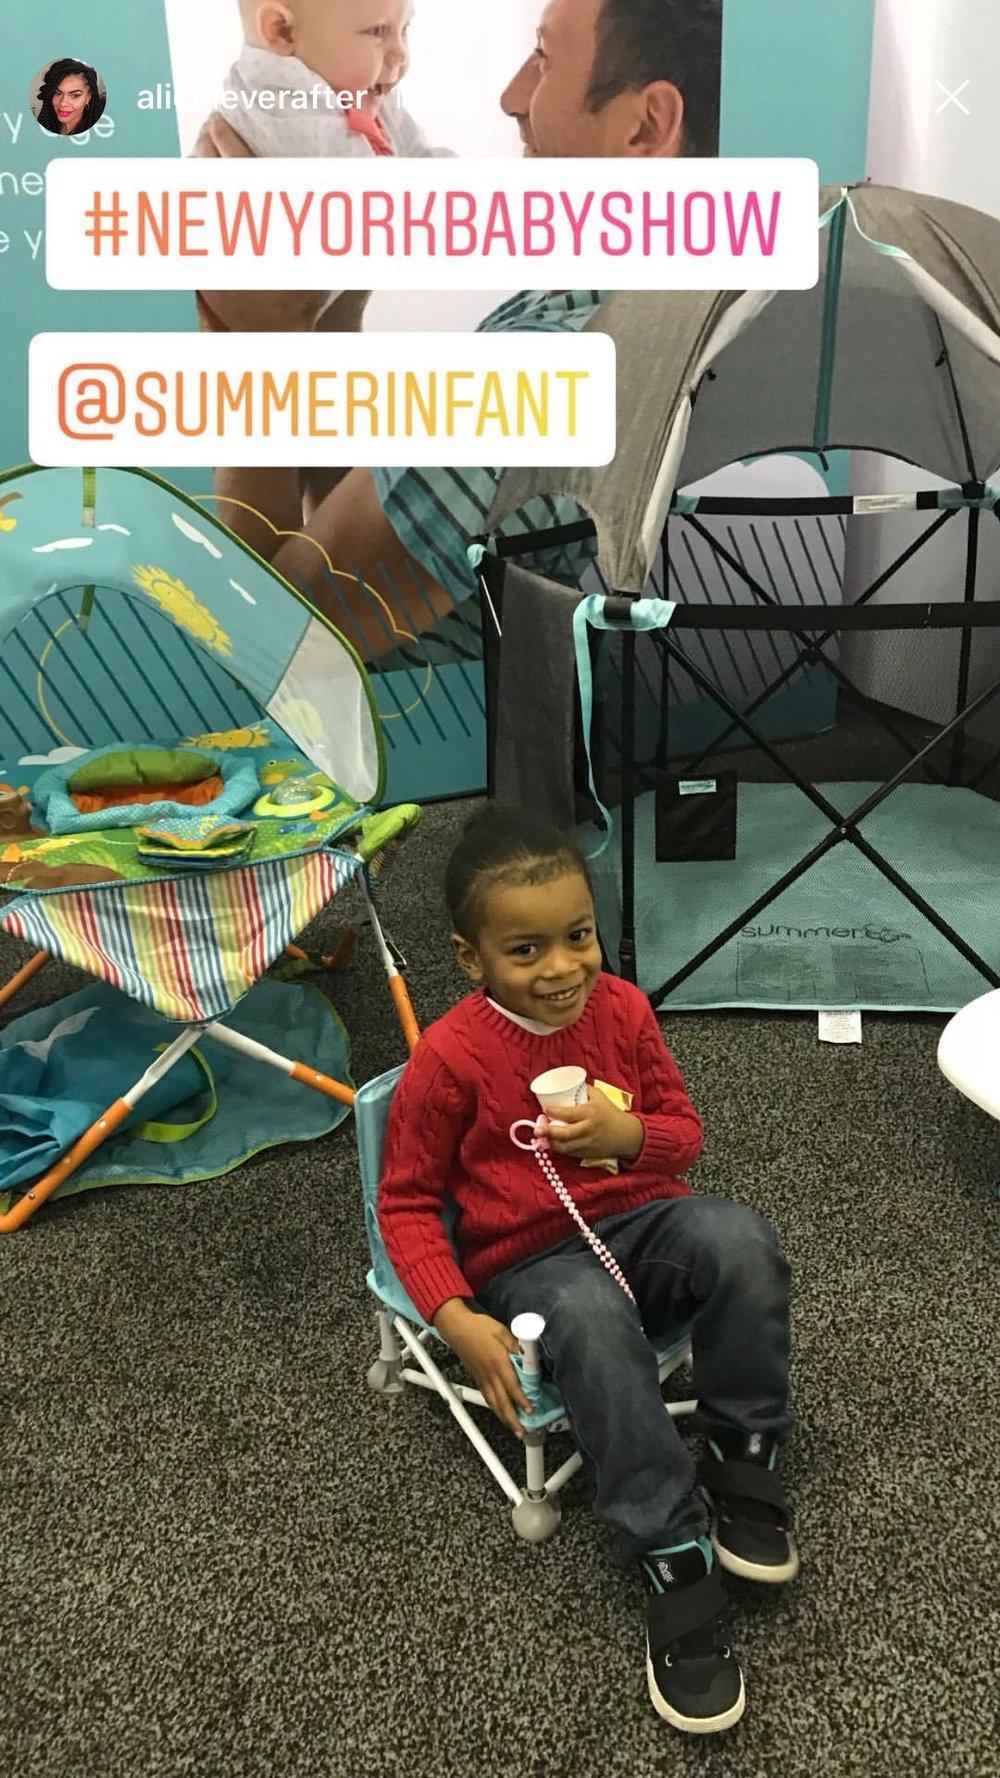 2018.05.19-20_Alicia Ever After, Instagram Story_Summer Infant Pop 'N Sit Portable Booster.jpg